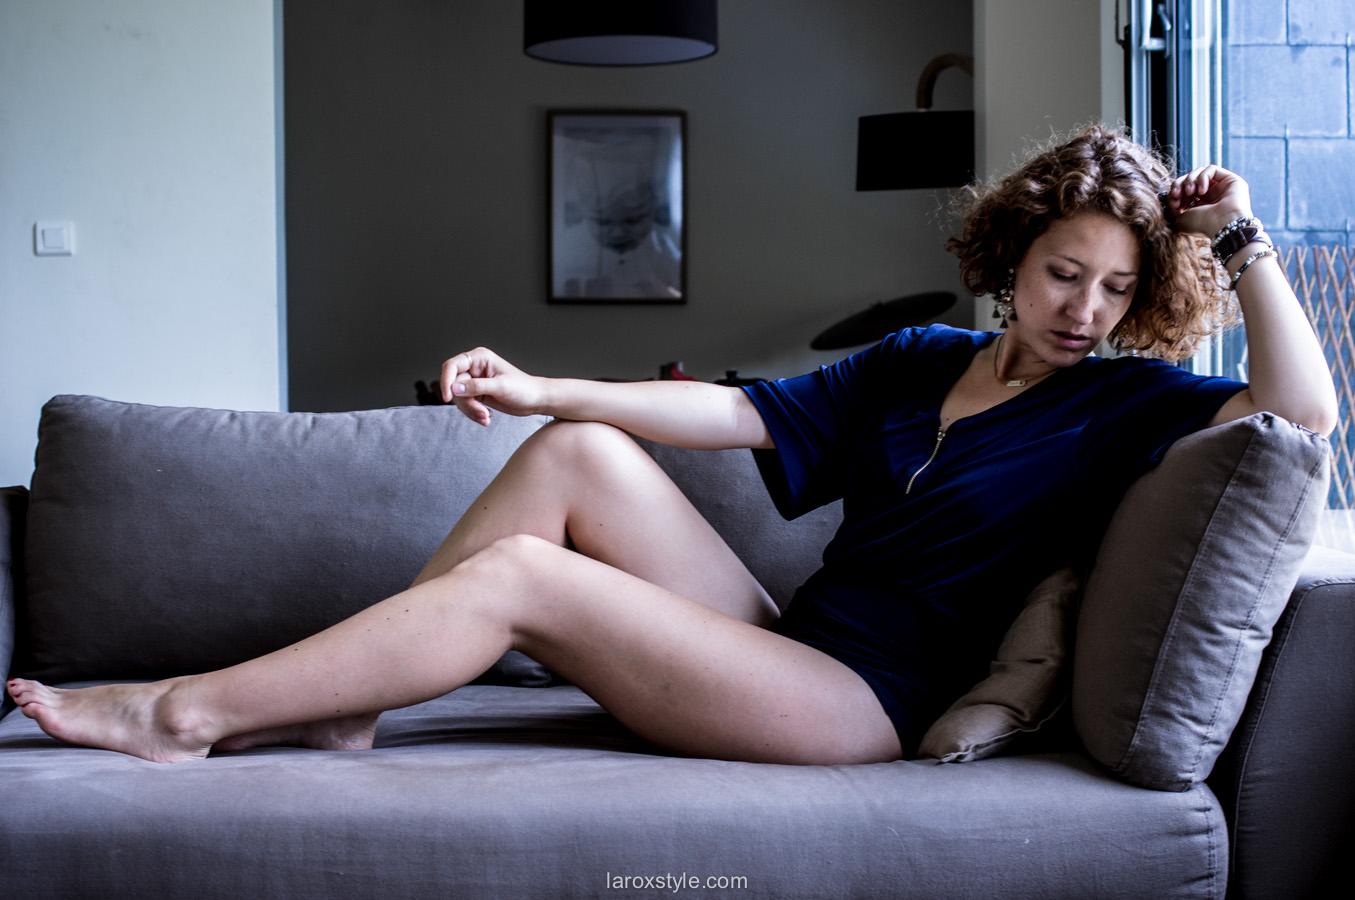 body luie - shooting mode - body femme